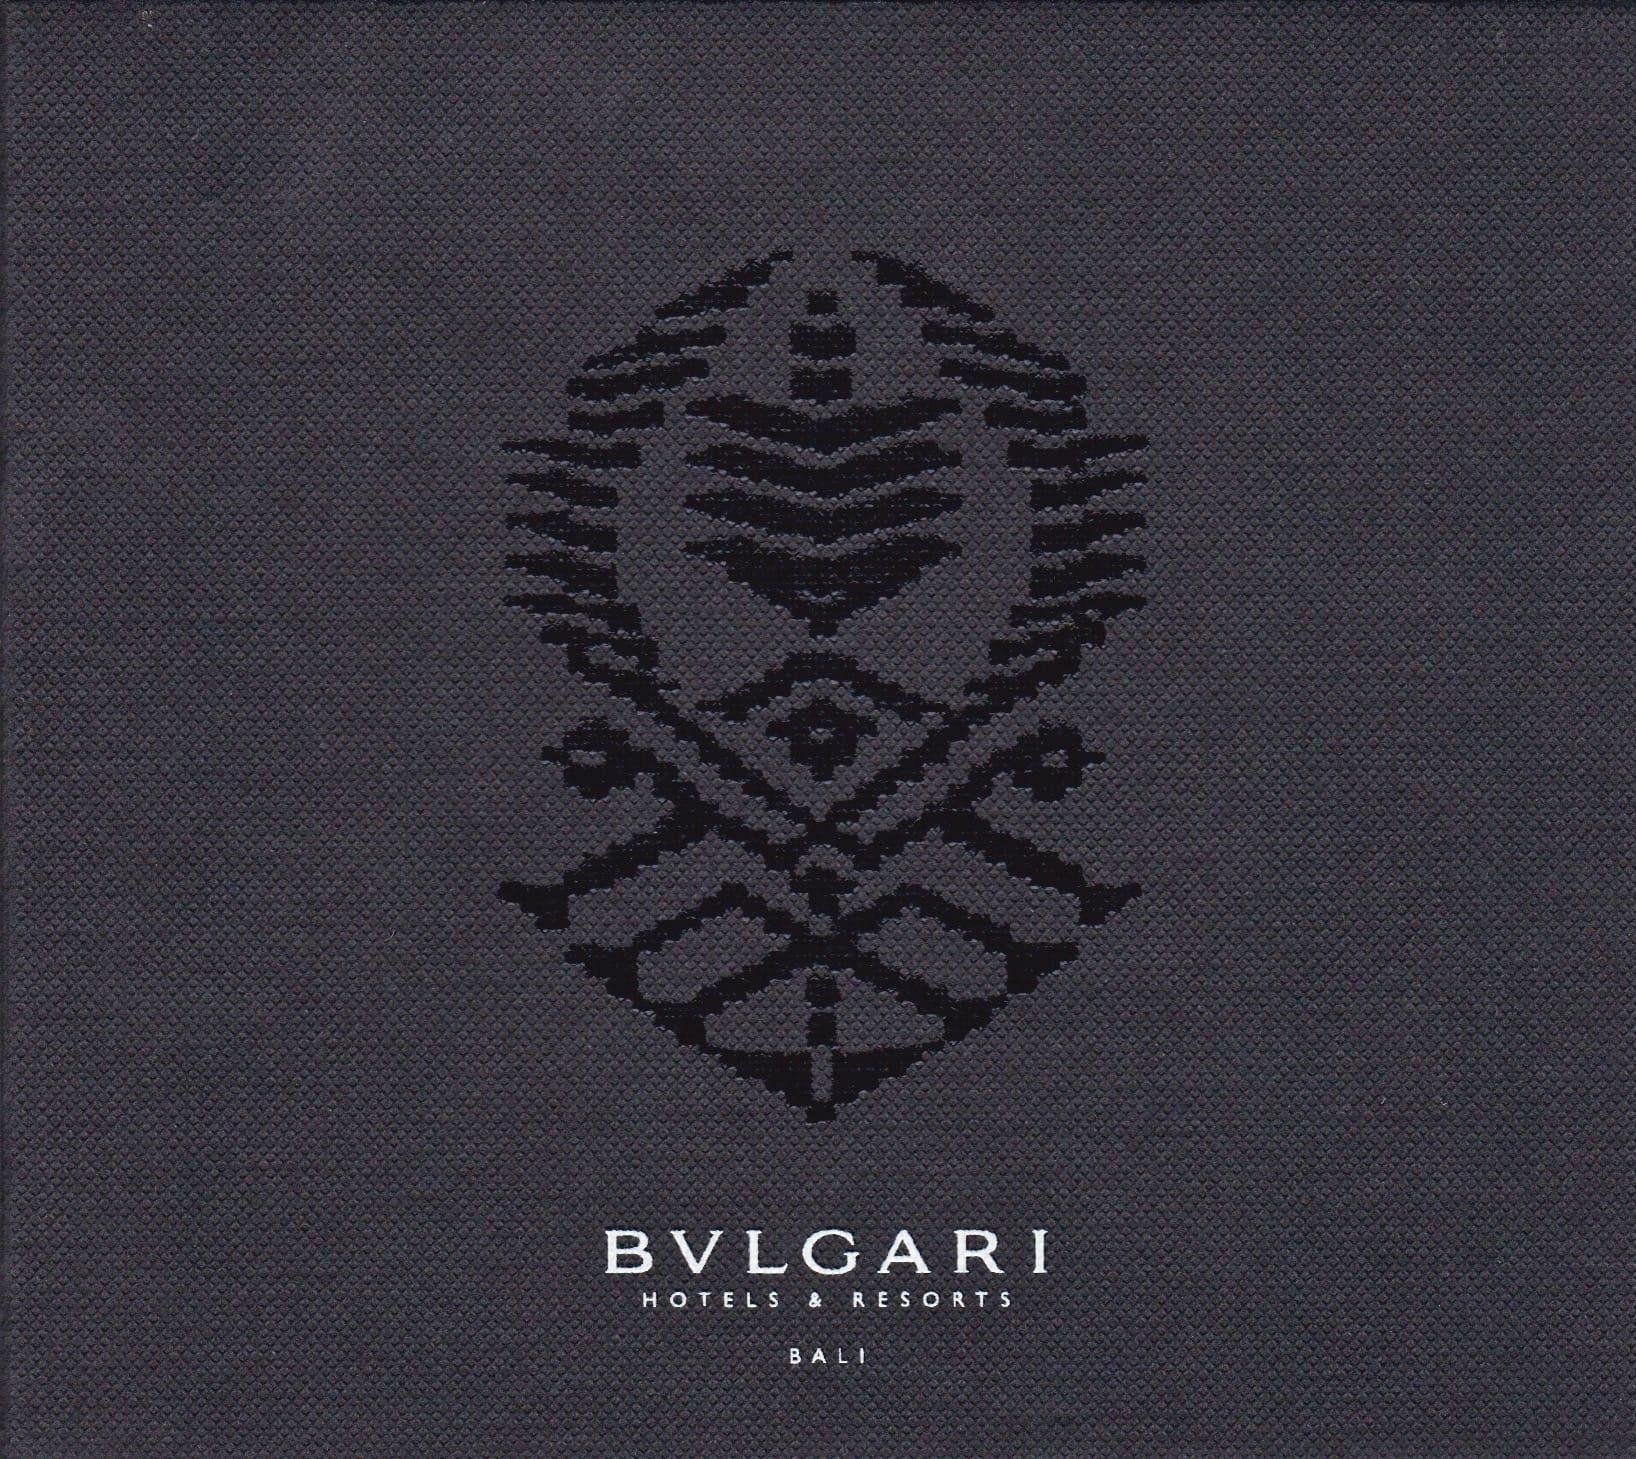 BULGARI Resorts & Hotels Bali ~ Uluwatu Experience ~ 2009